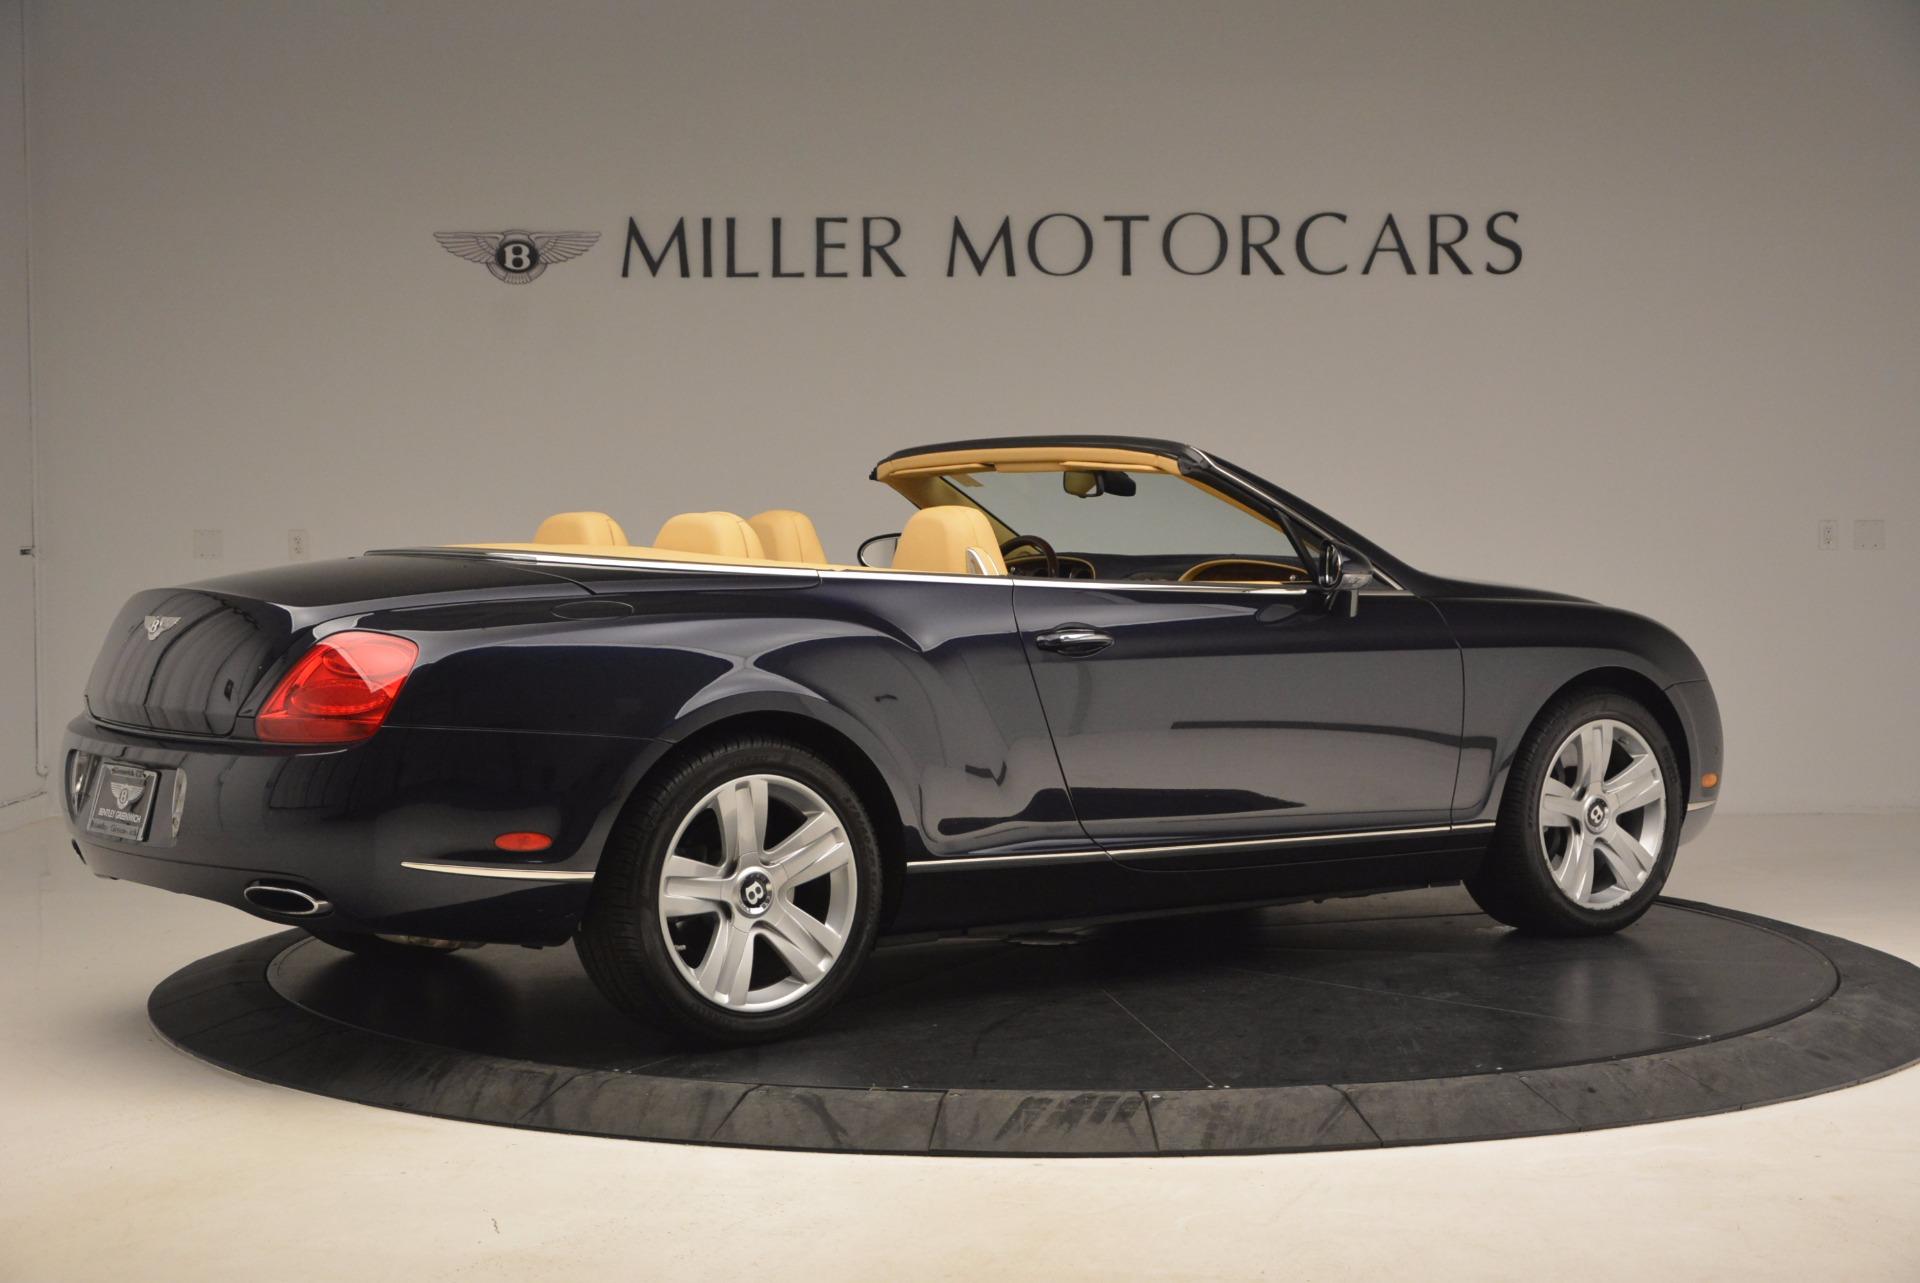 Used 2007 Bentley Continental GTC  For Sale In Westport, CT 1186_p8